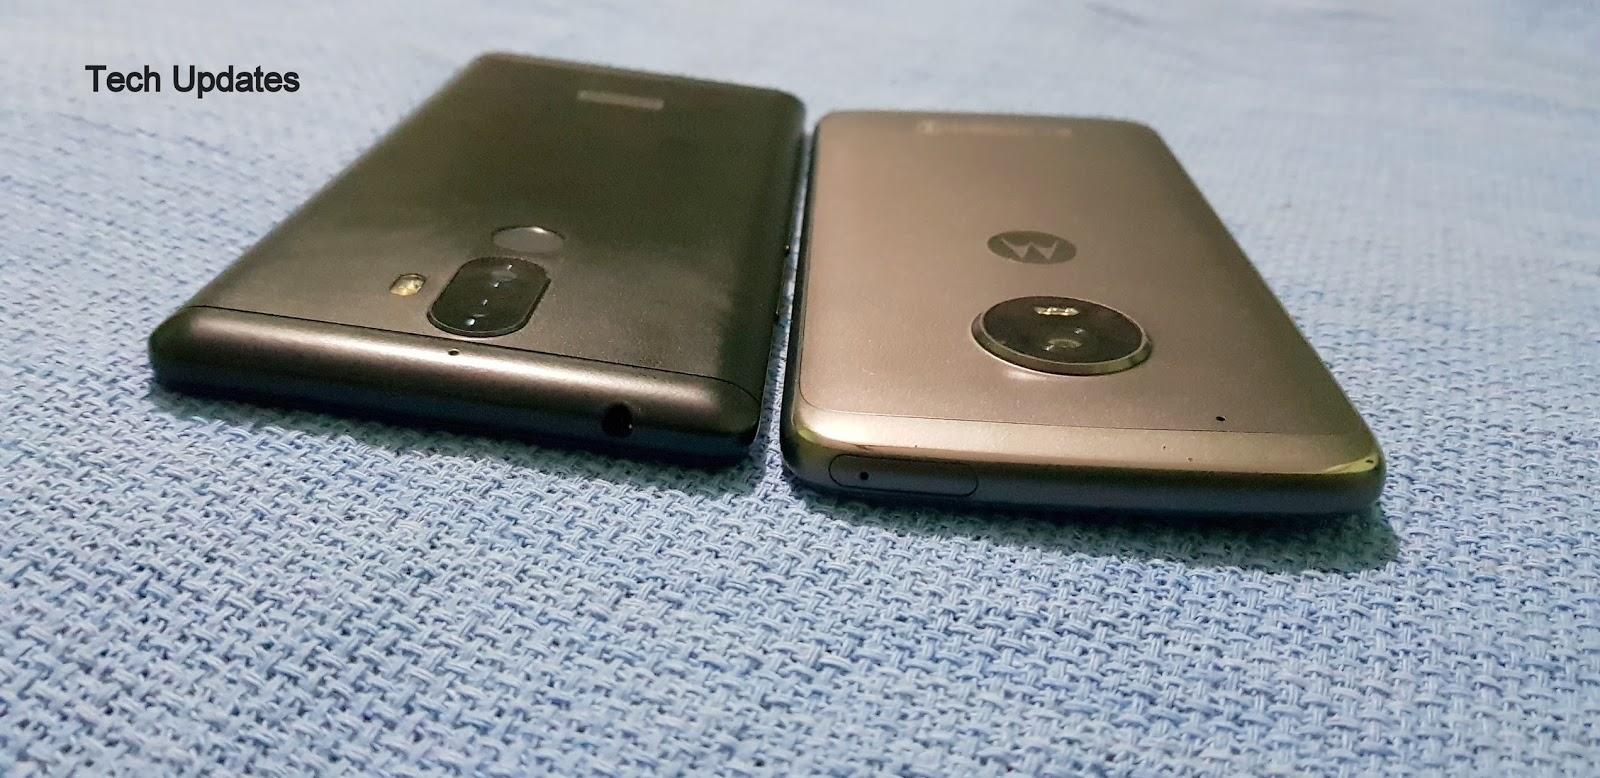 Lenovo K8 Note vs Moto G5 Plus : Price,Specs, Features